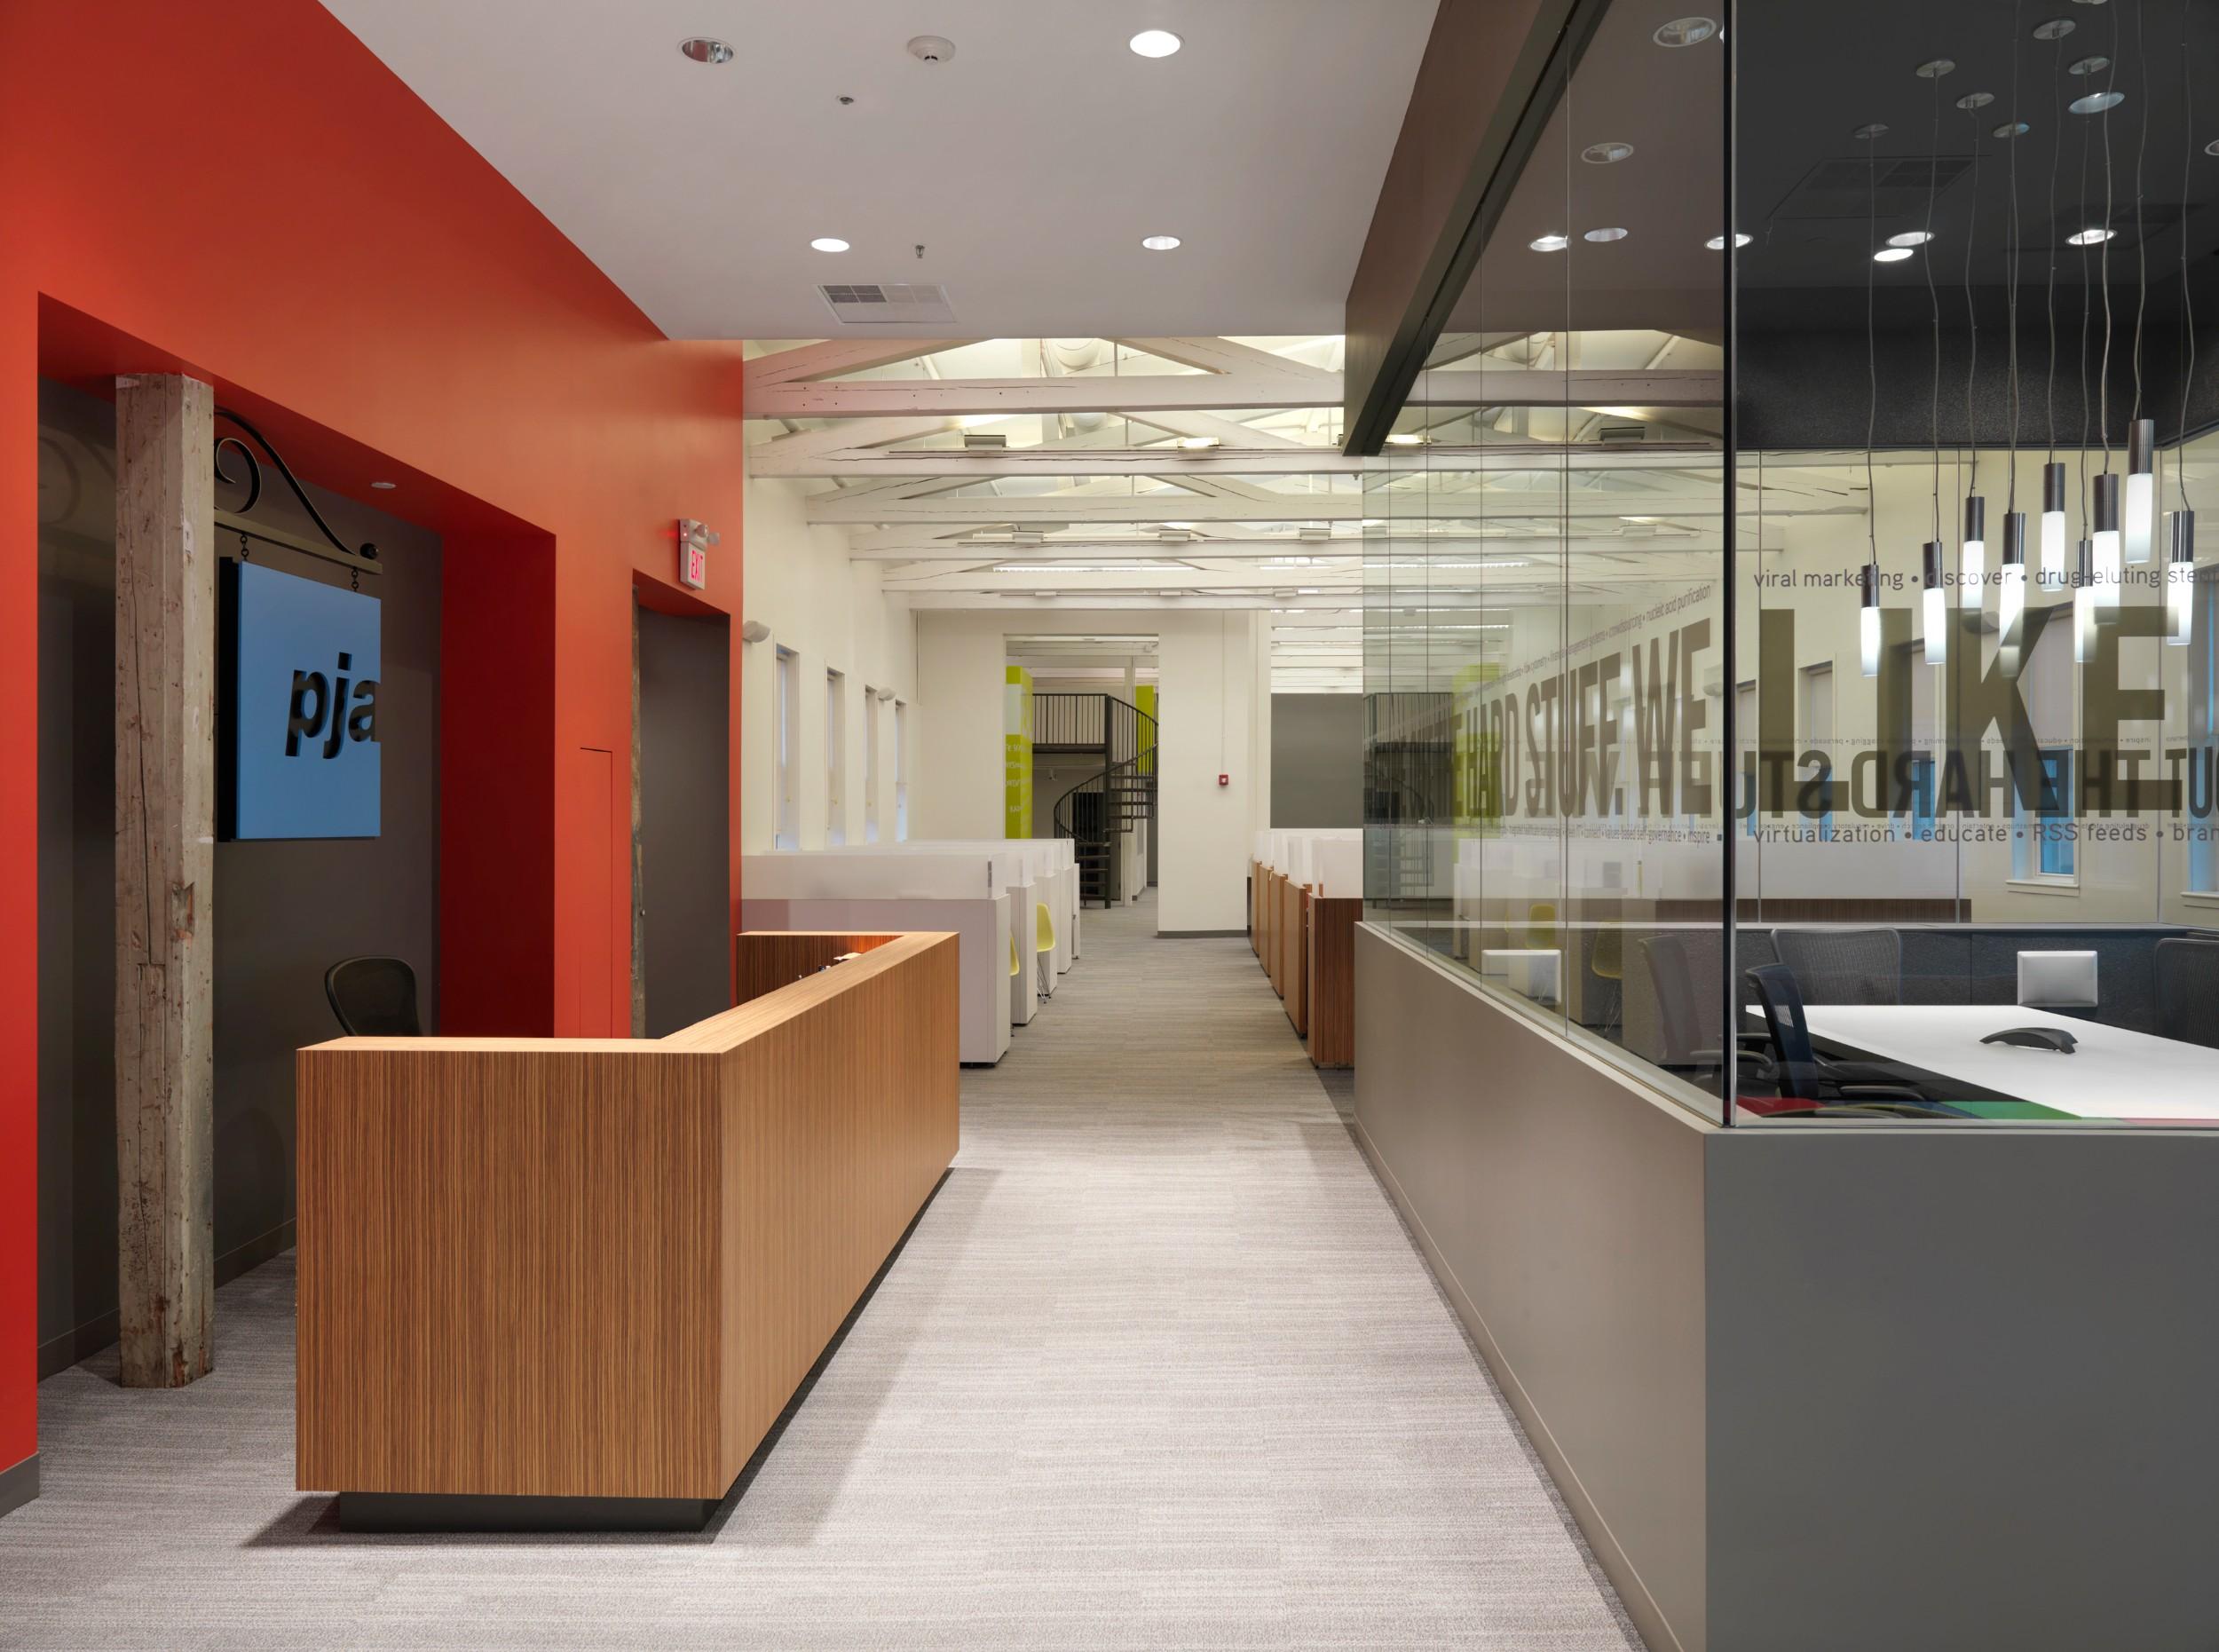 PJA_Advertising_Corderman_Construction_Hallway_View.jpg